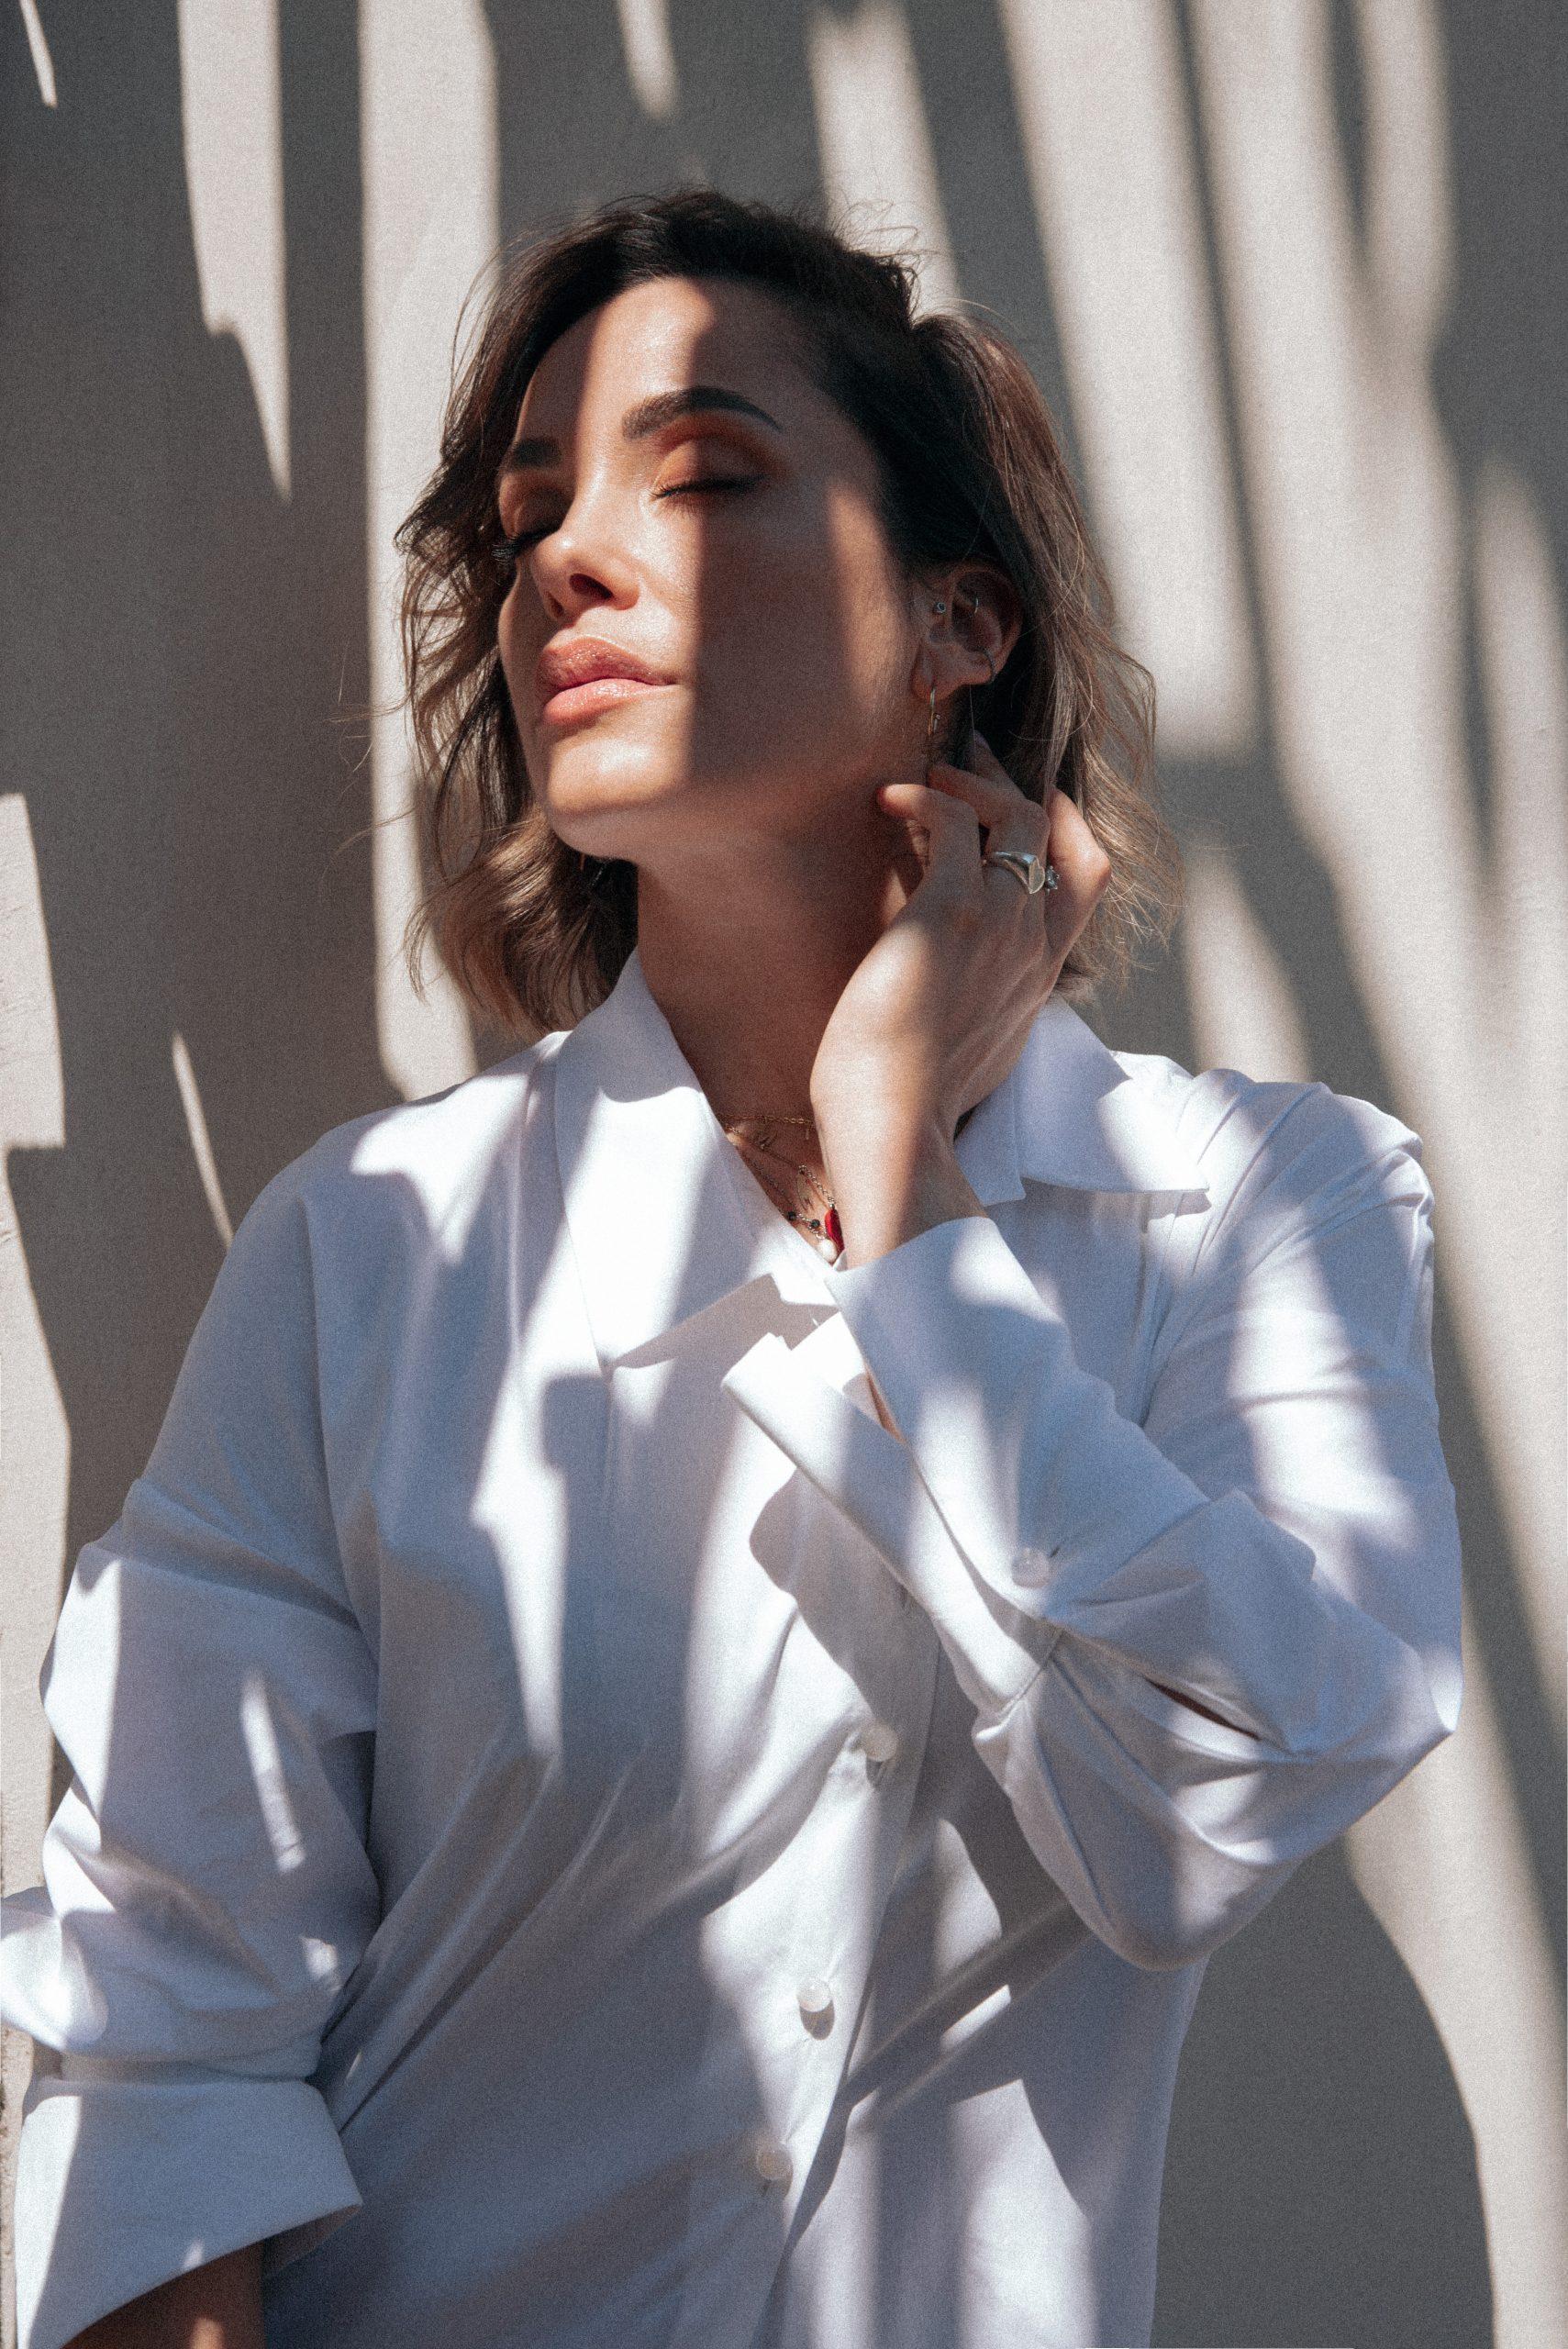 Alessandra Valenti